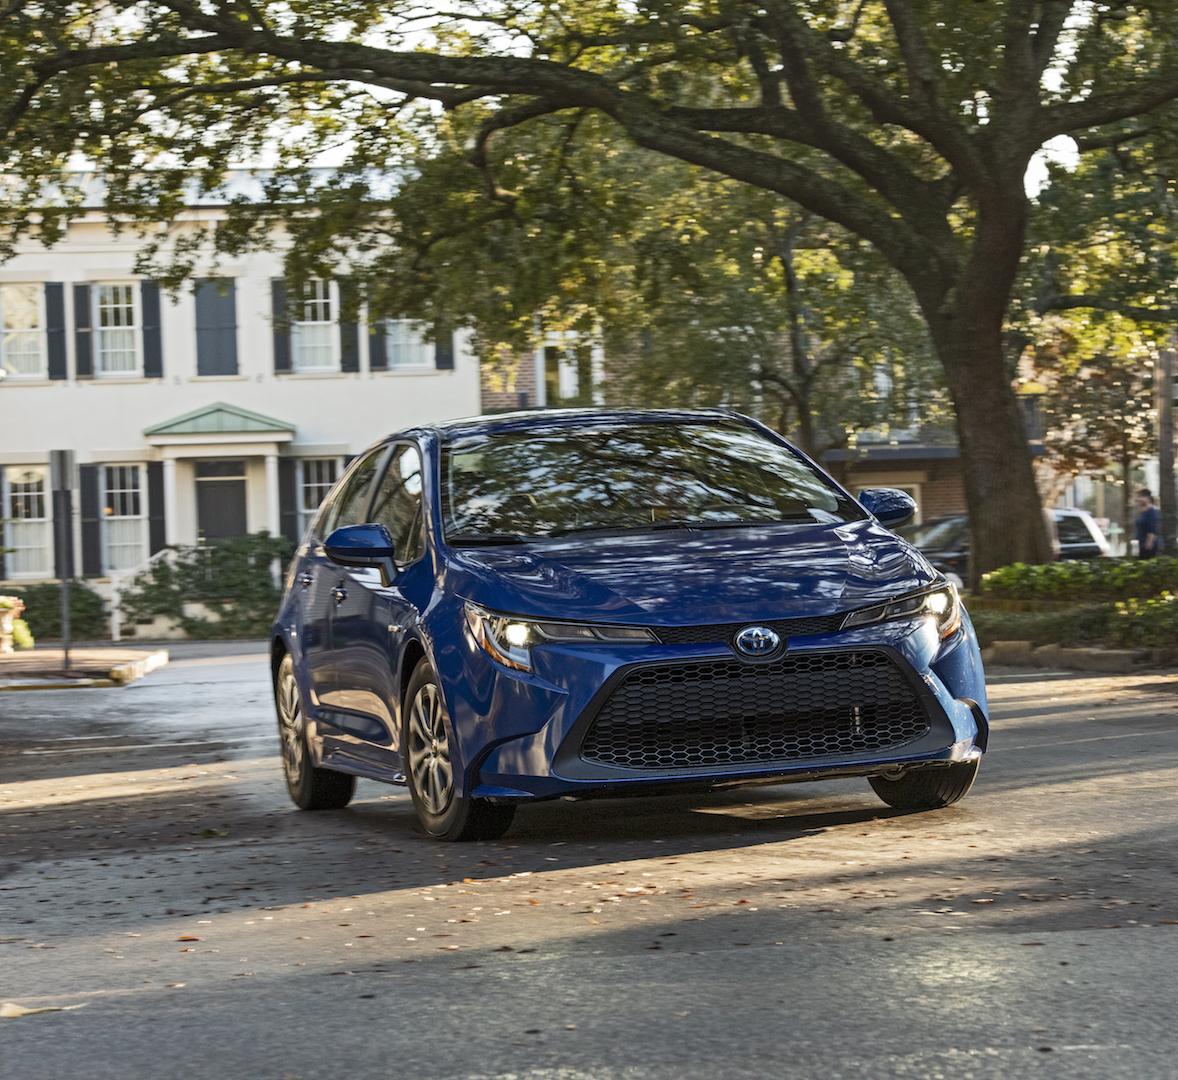 Video: 2020 Toyota Corolla Amazon Alexa & Google Home In